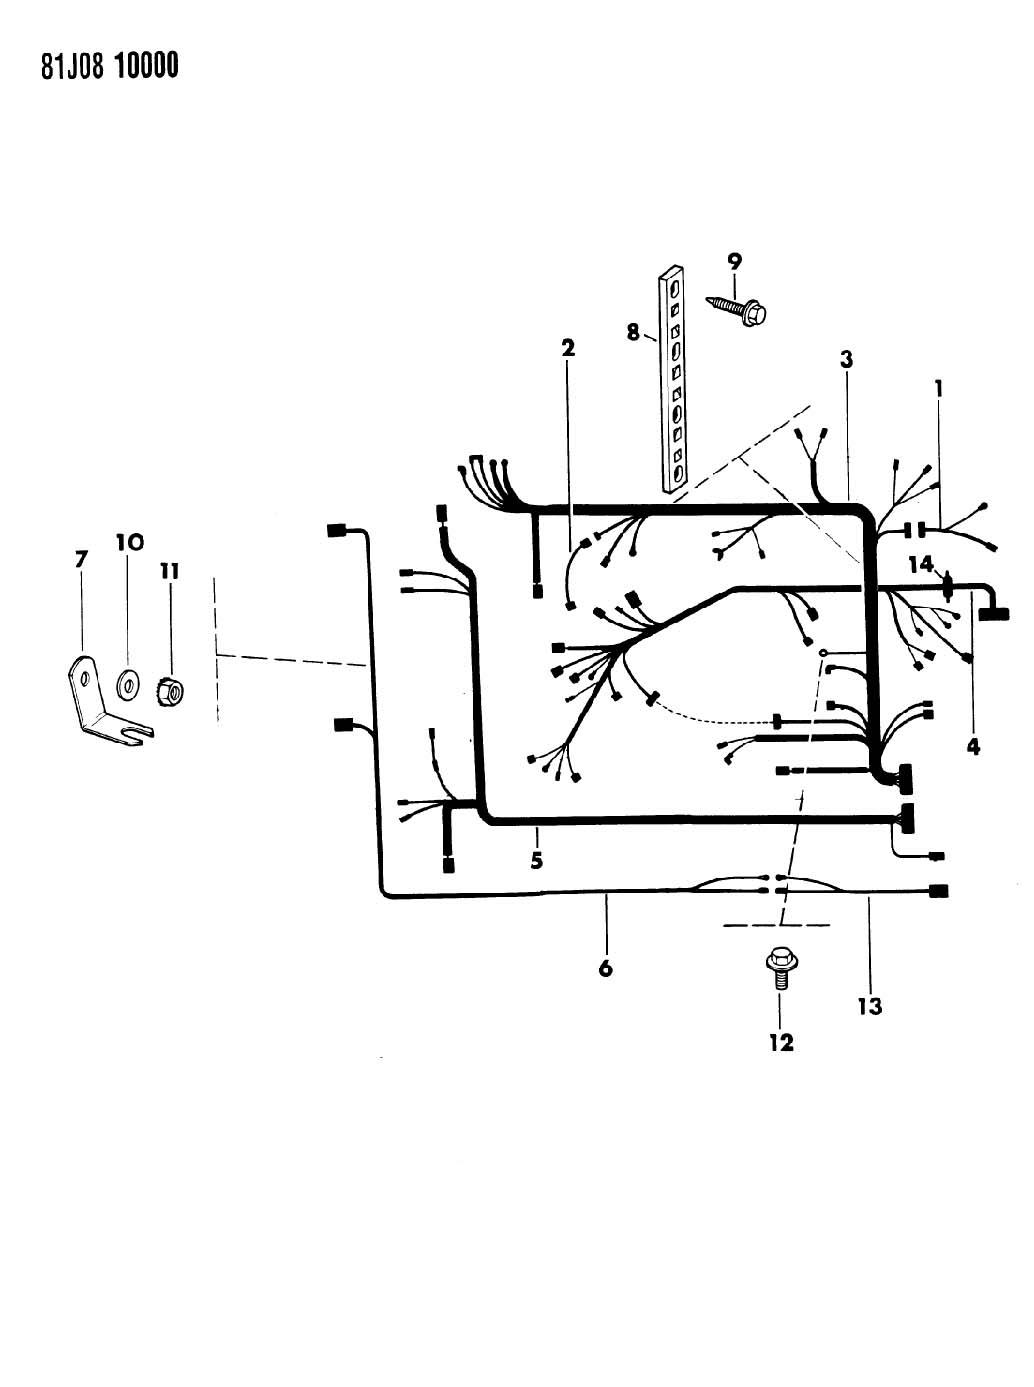 1986 jeep grand wagoneer wiring engine compartment sj. Black Bedroom Furniture Sets. Home Design Ideas